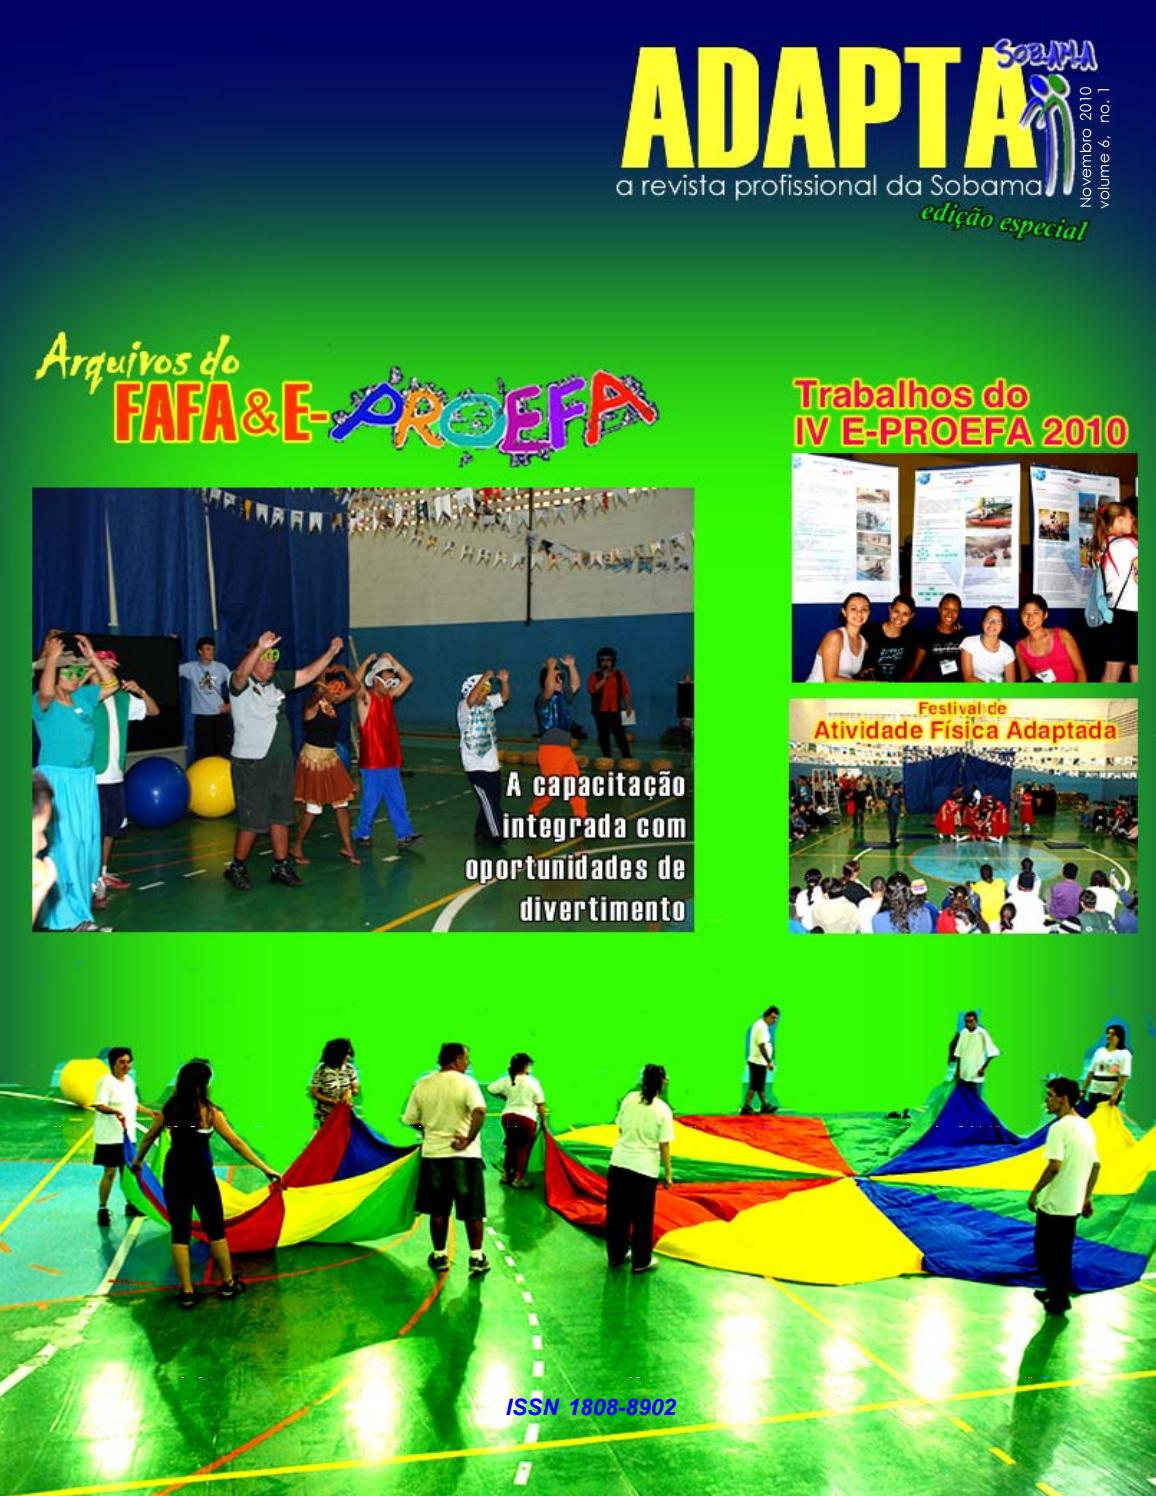 "Fitness Exercício Academia Indoor Trainer Esportivo 45/"" no rebote Trampolim Infantil Feminino"